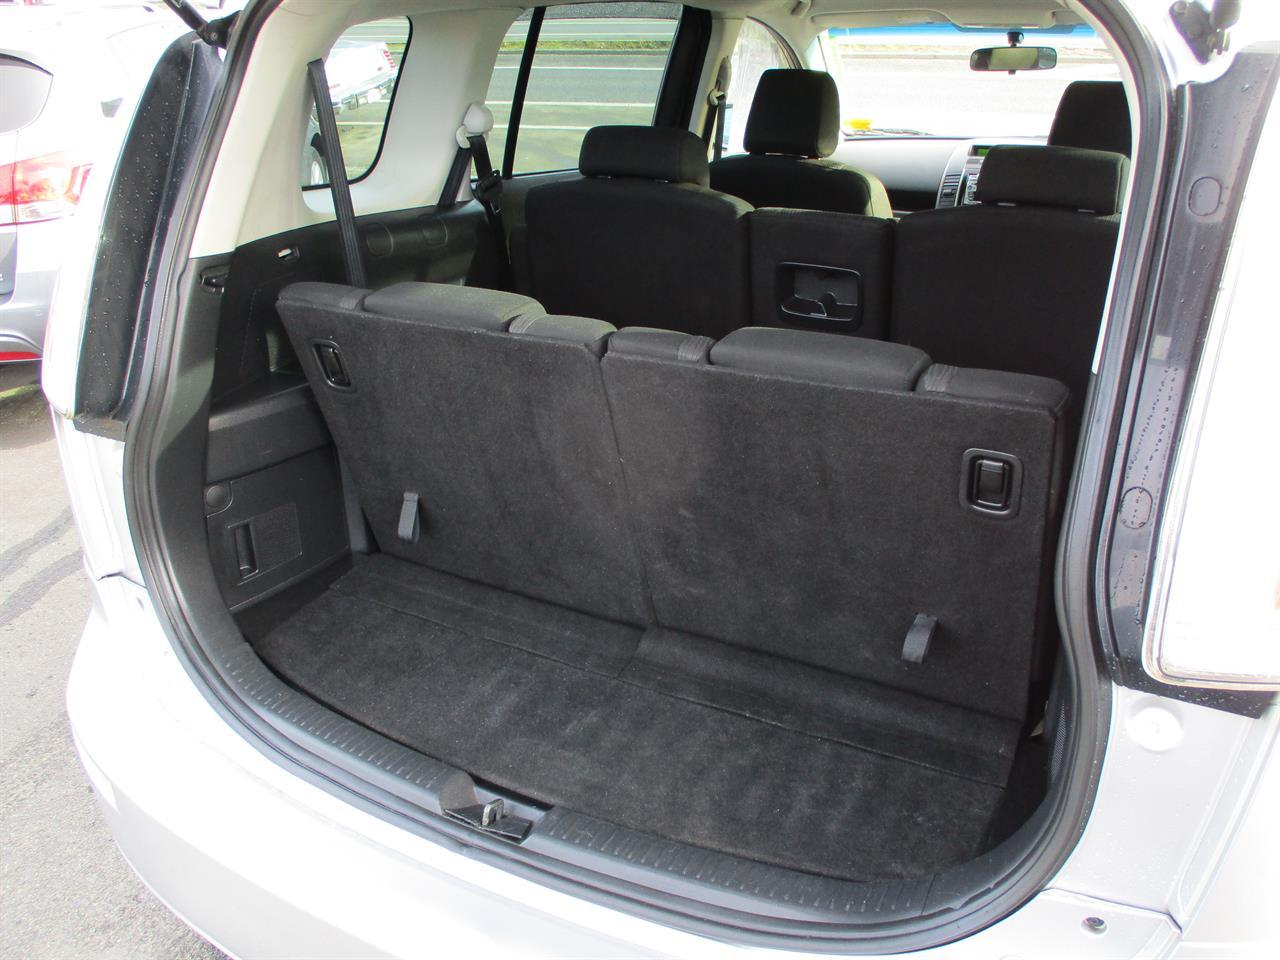 image-9, 2010 Mazda Premacy Seven Seater at Dunedin